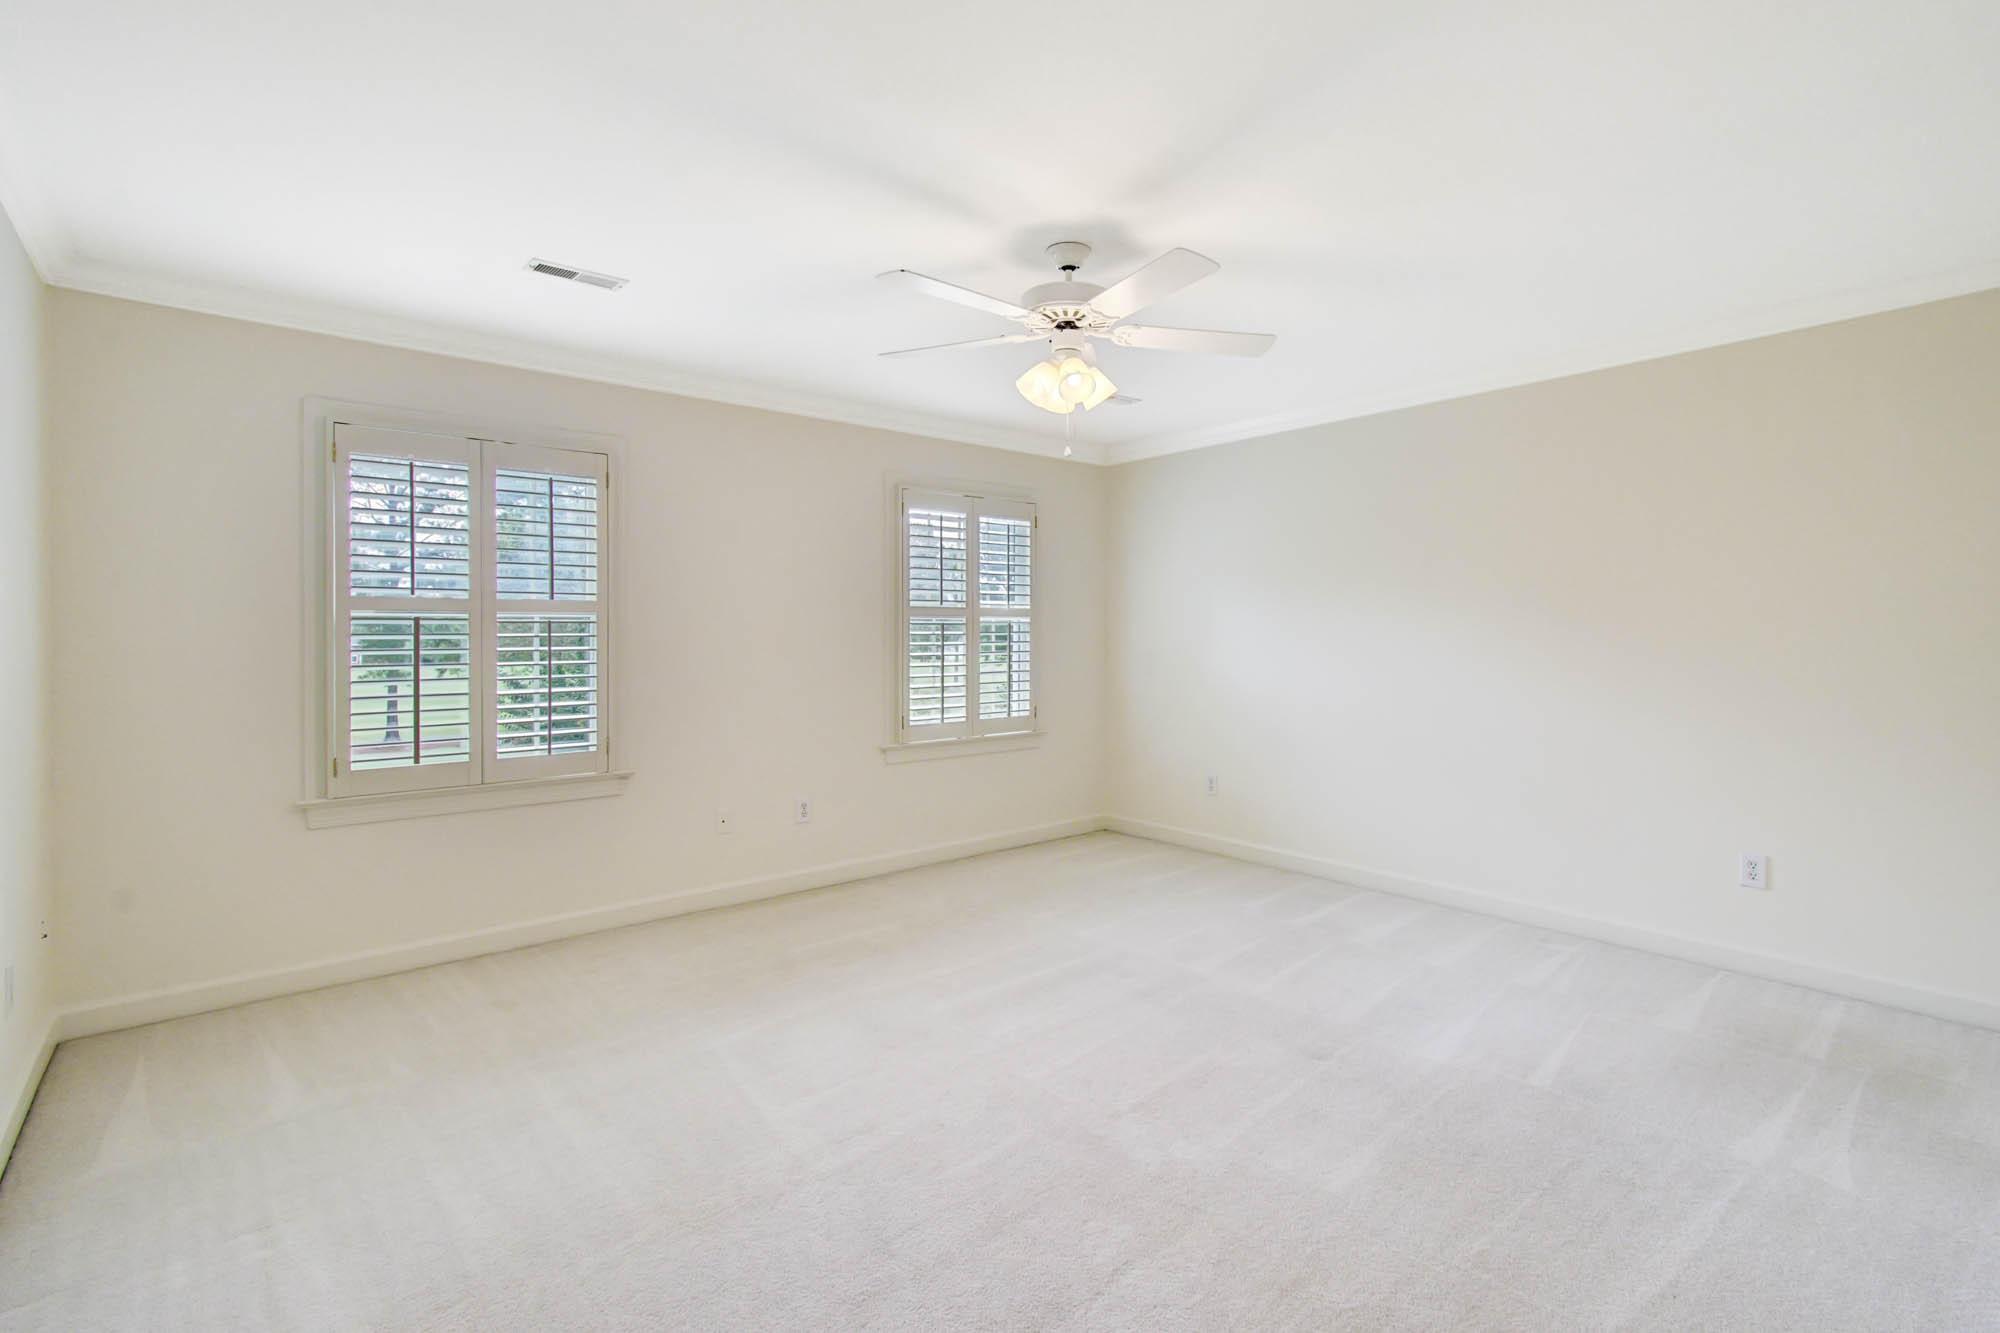 Dunes West Homes For Sale - 3515 Colonel Vanderhorst, Mount Pleasant, SC - 7